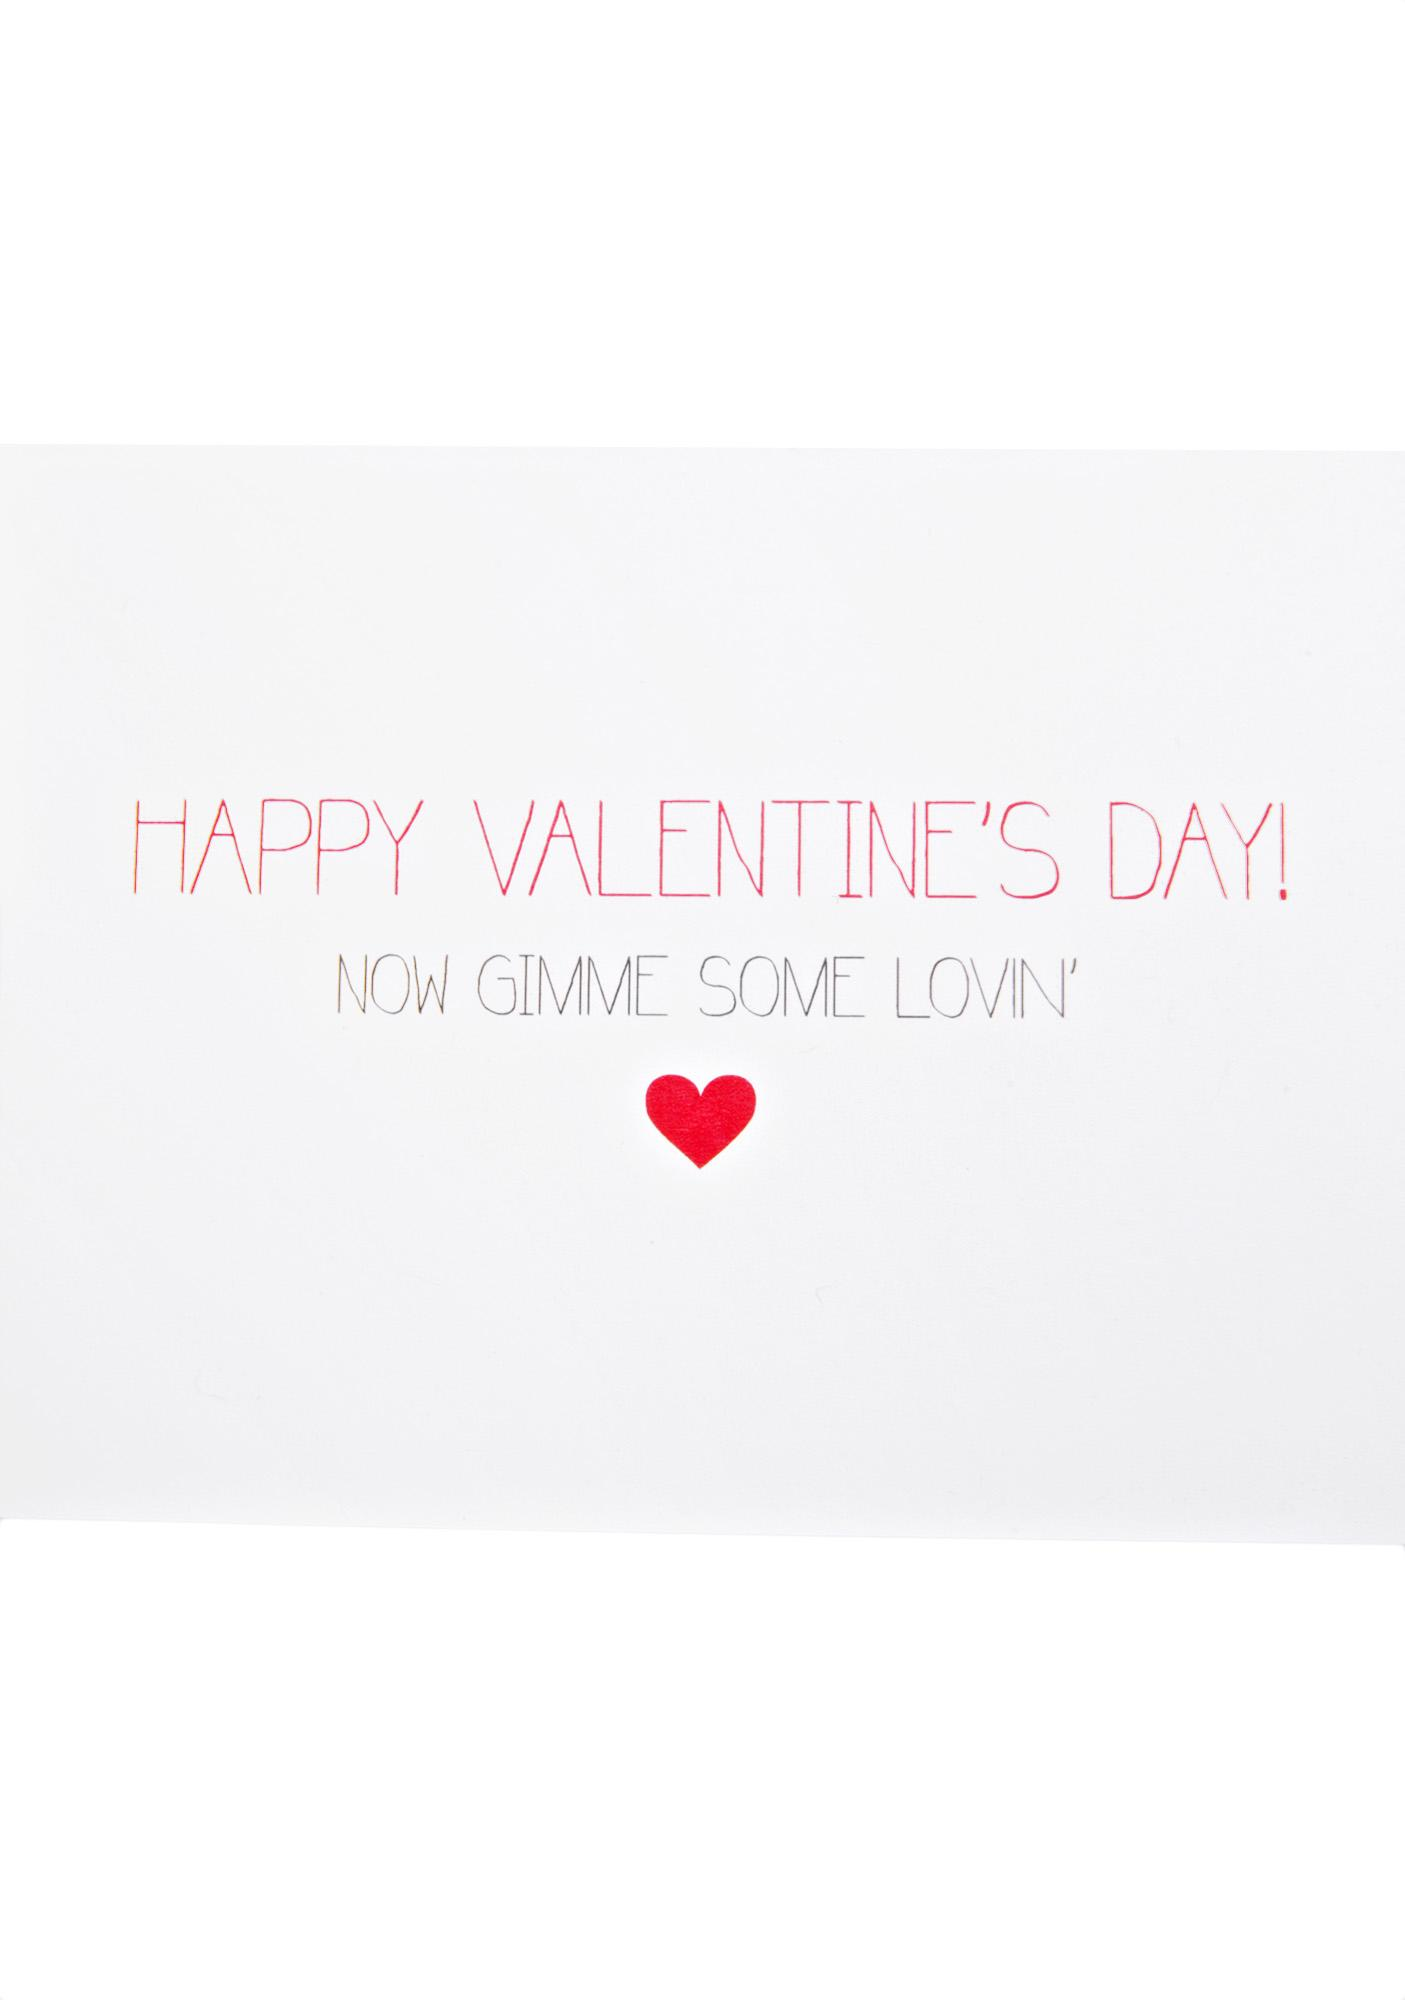 Get Some Lovin' Card